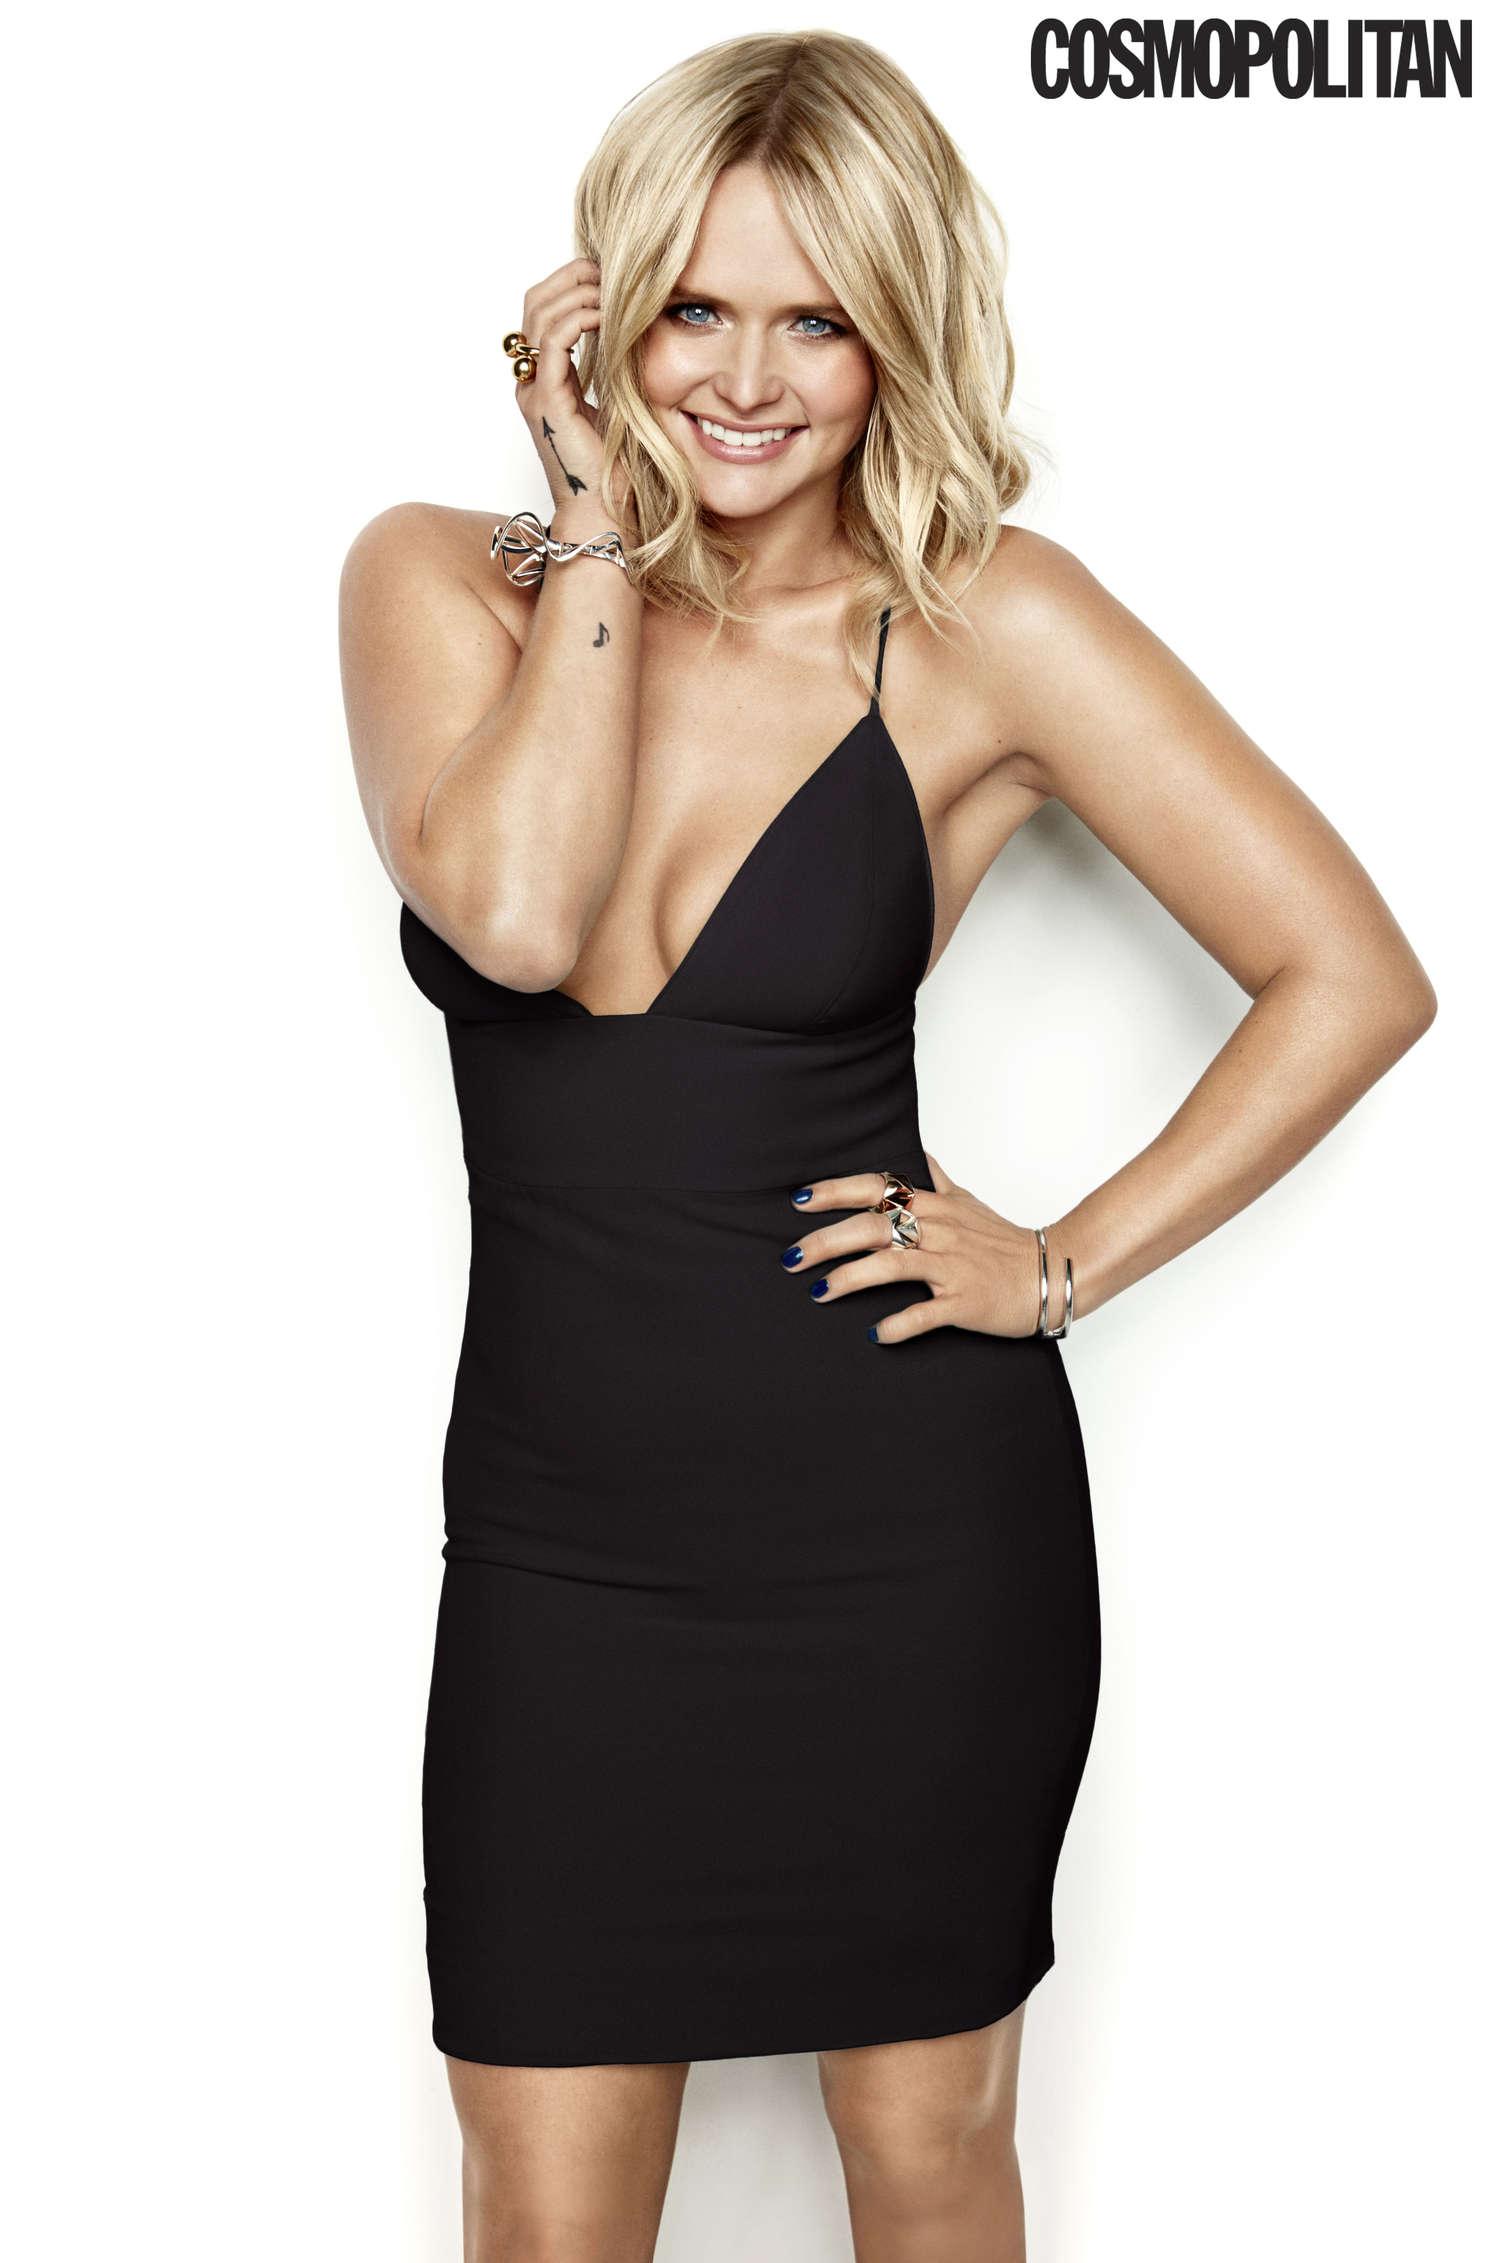 Miranda Lambert Cosmopolitan Magazine